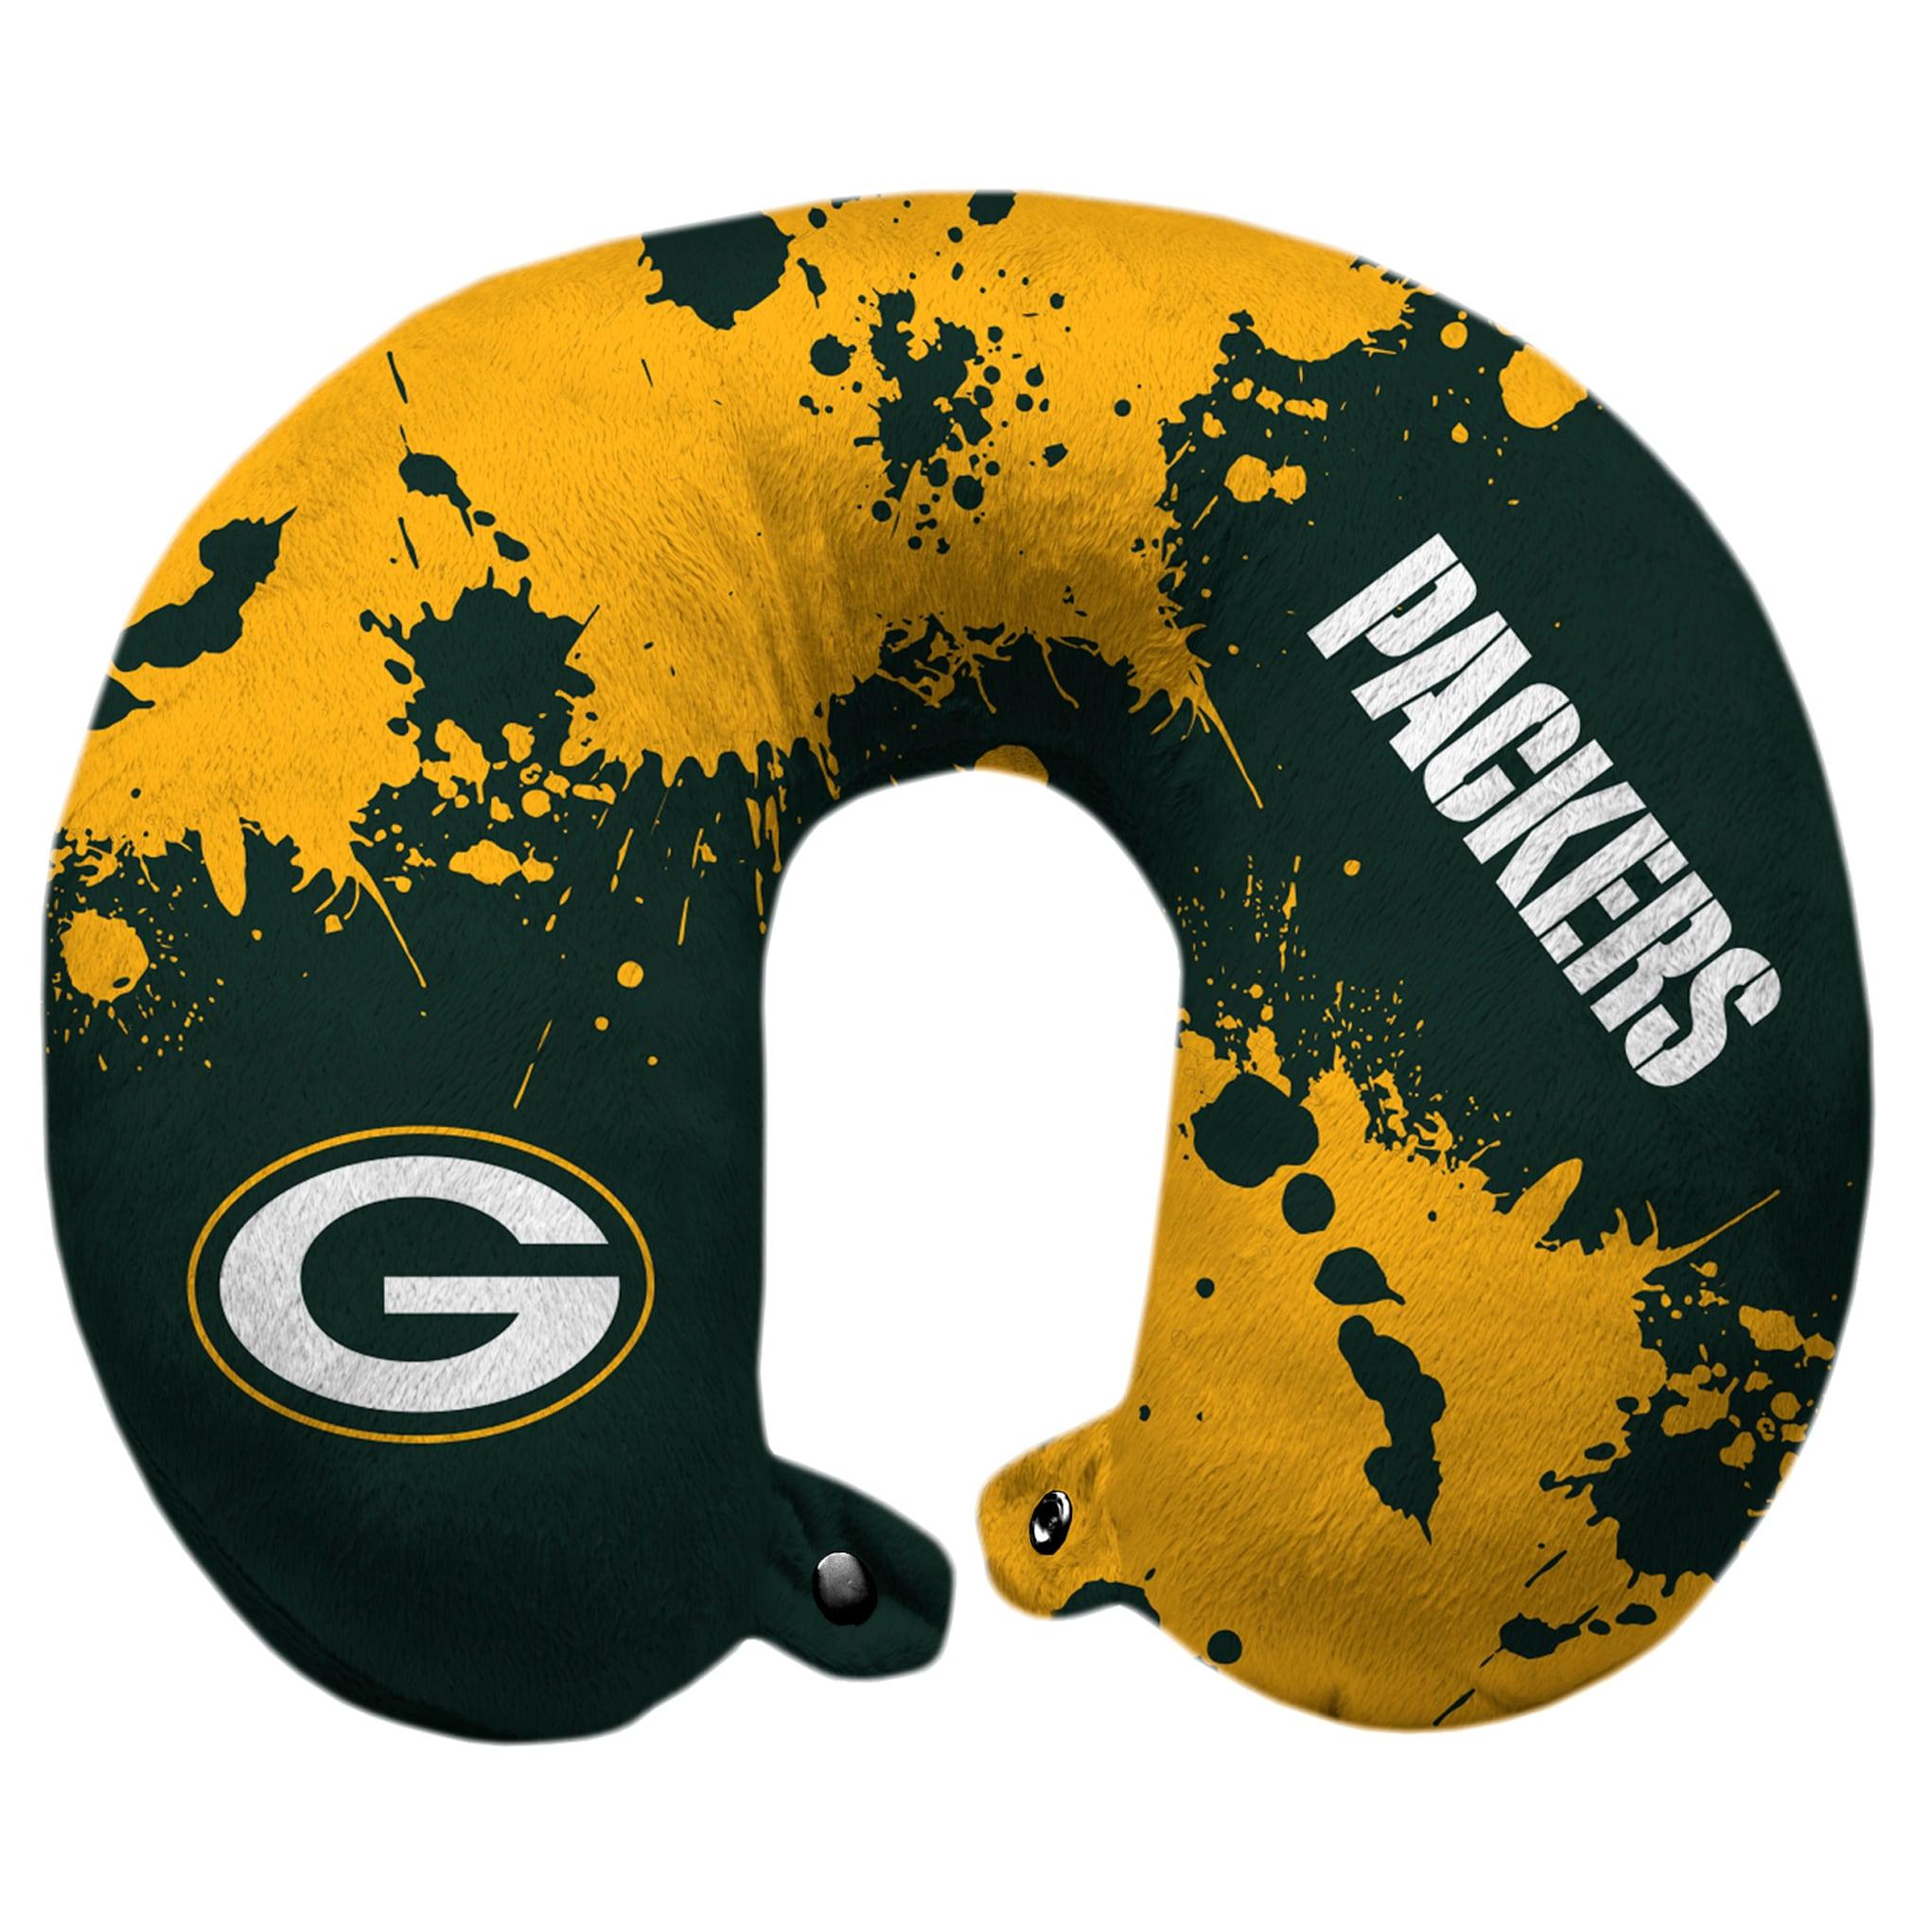 Green Bay Packers Splatter Polyester Snap Closure Travel Pillow - Green